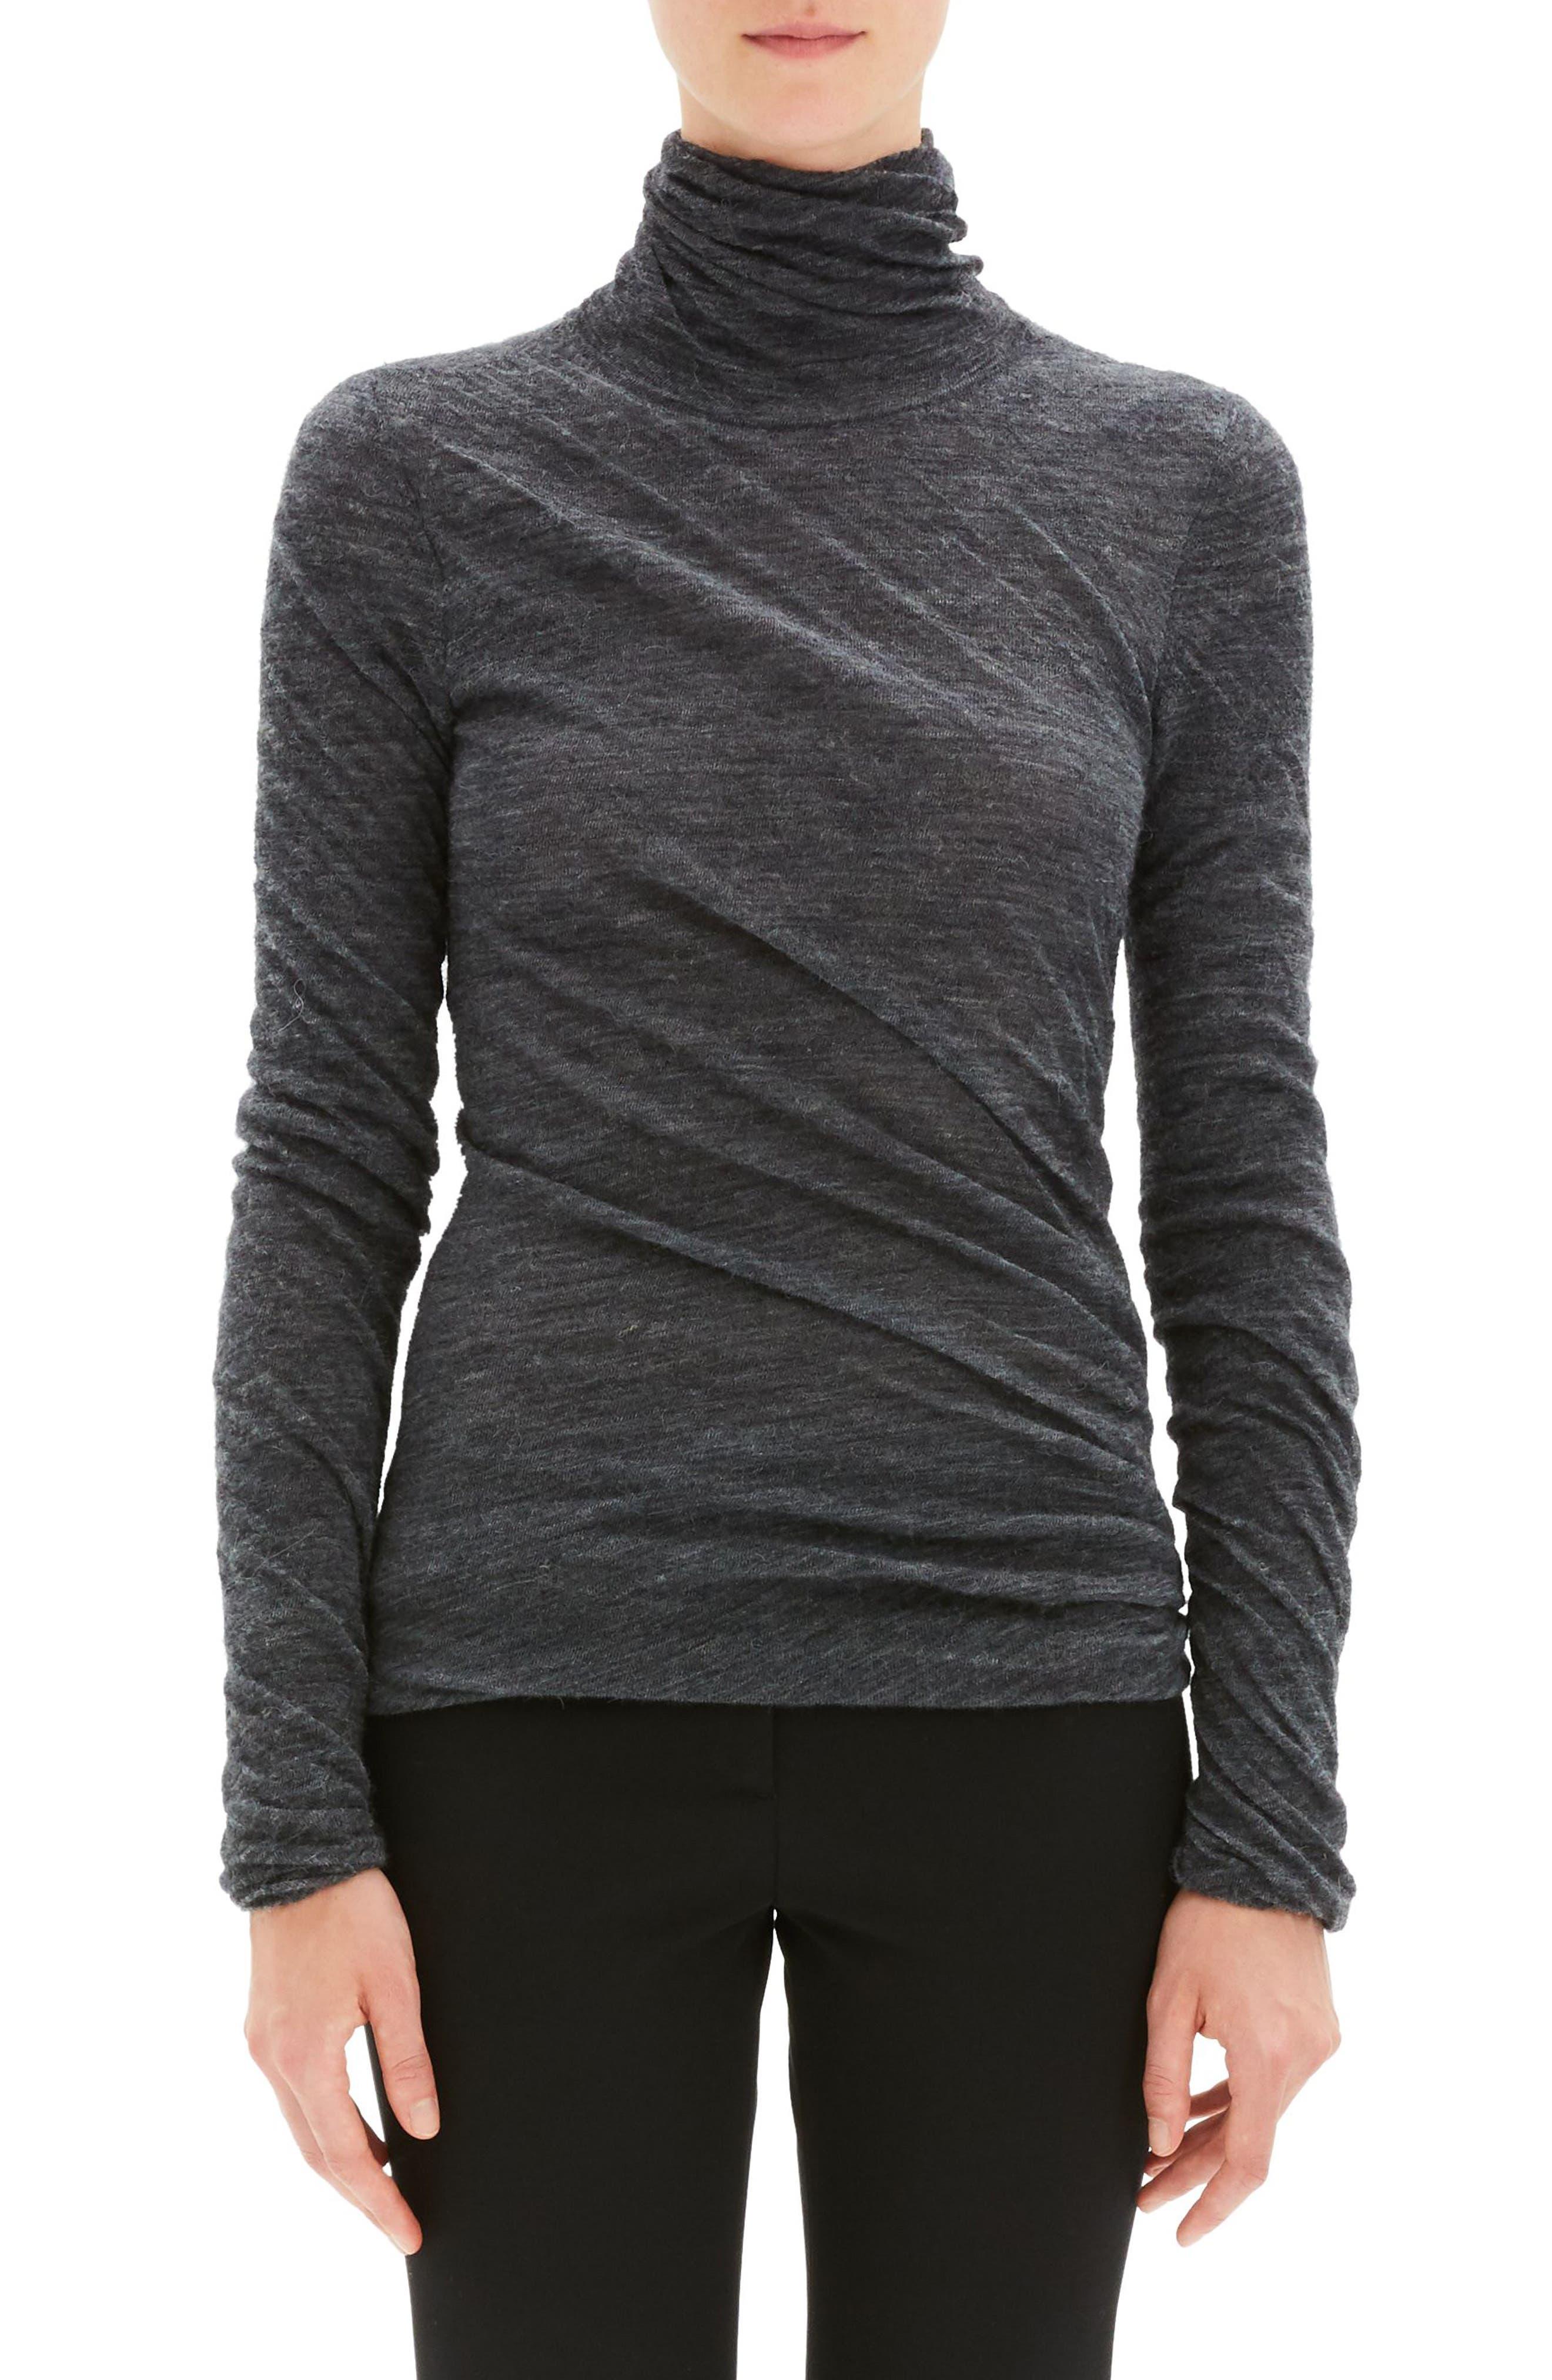 Twist Turtleneck Sweater,                             Main thumbnail 1, color,                             030